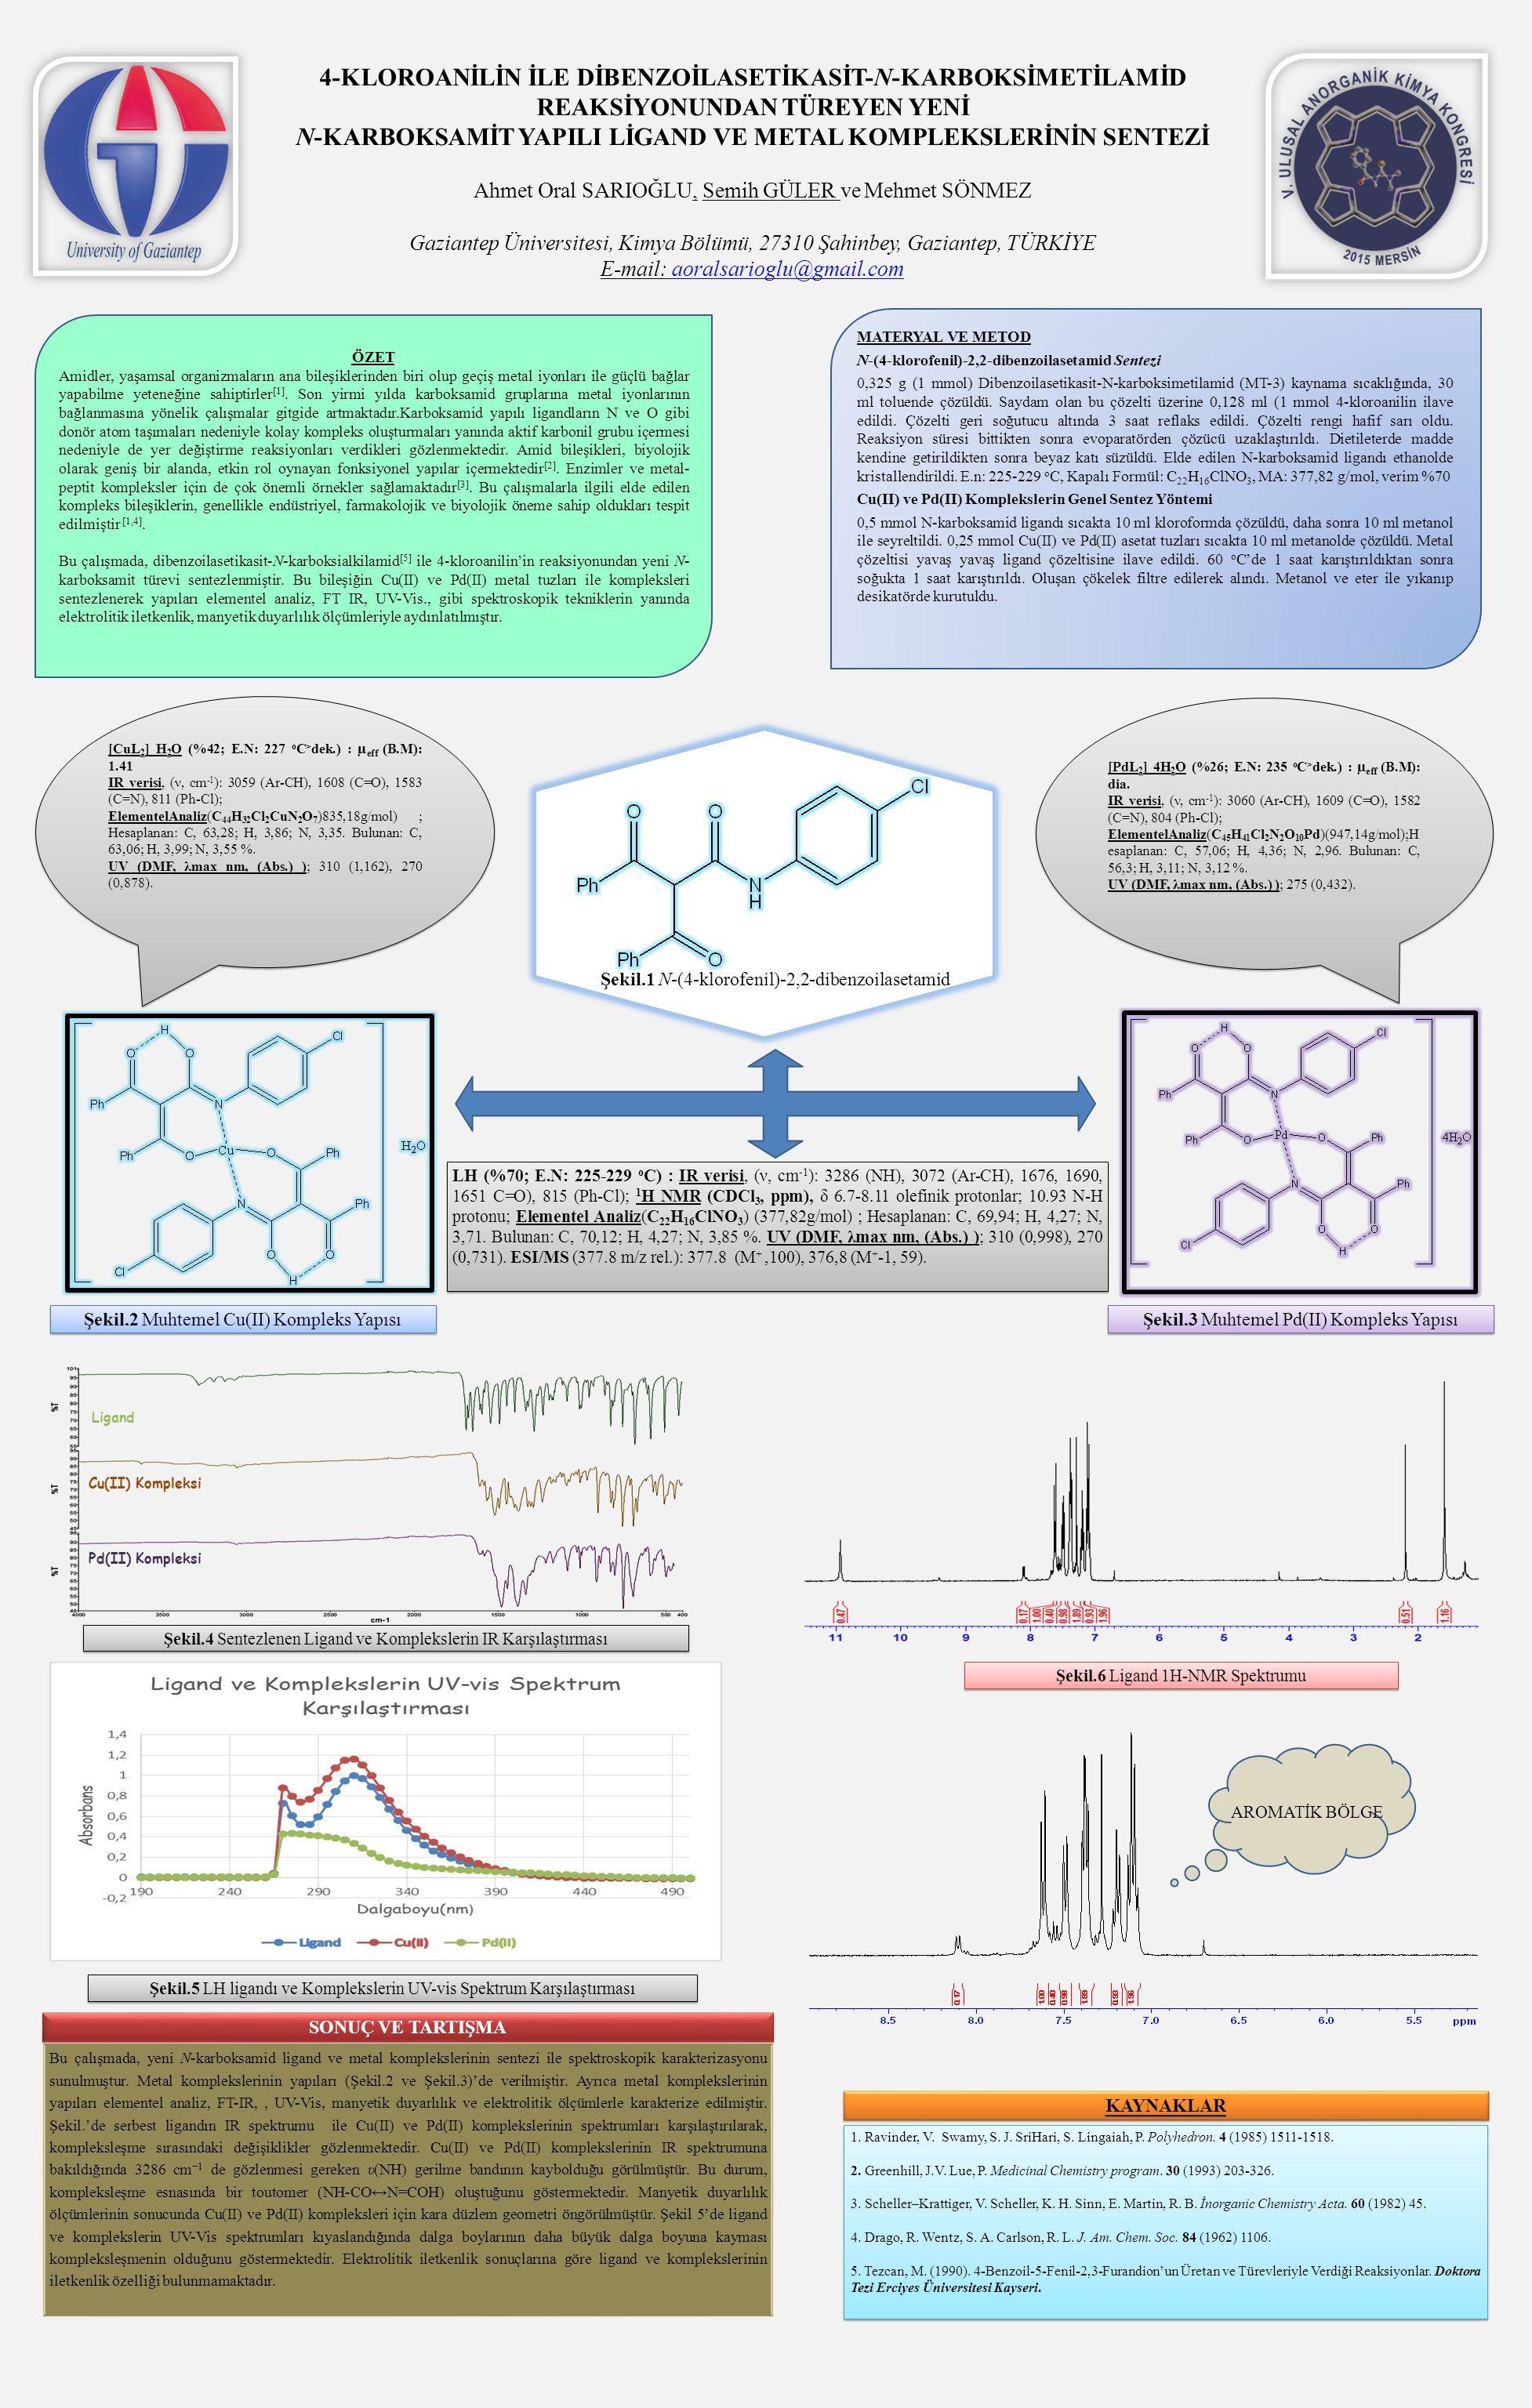 KAYNAKLAR 1. Ravinder, V. Swamy, S. J. SriHari, S. Lingaiah, P. Polyhedron. 4 (1985) 1511-1518. 2. Greenhill, J.V. Lue, P. Medicinal Chemistry program